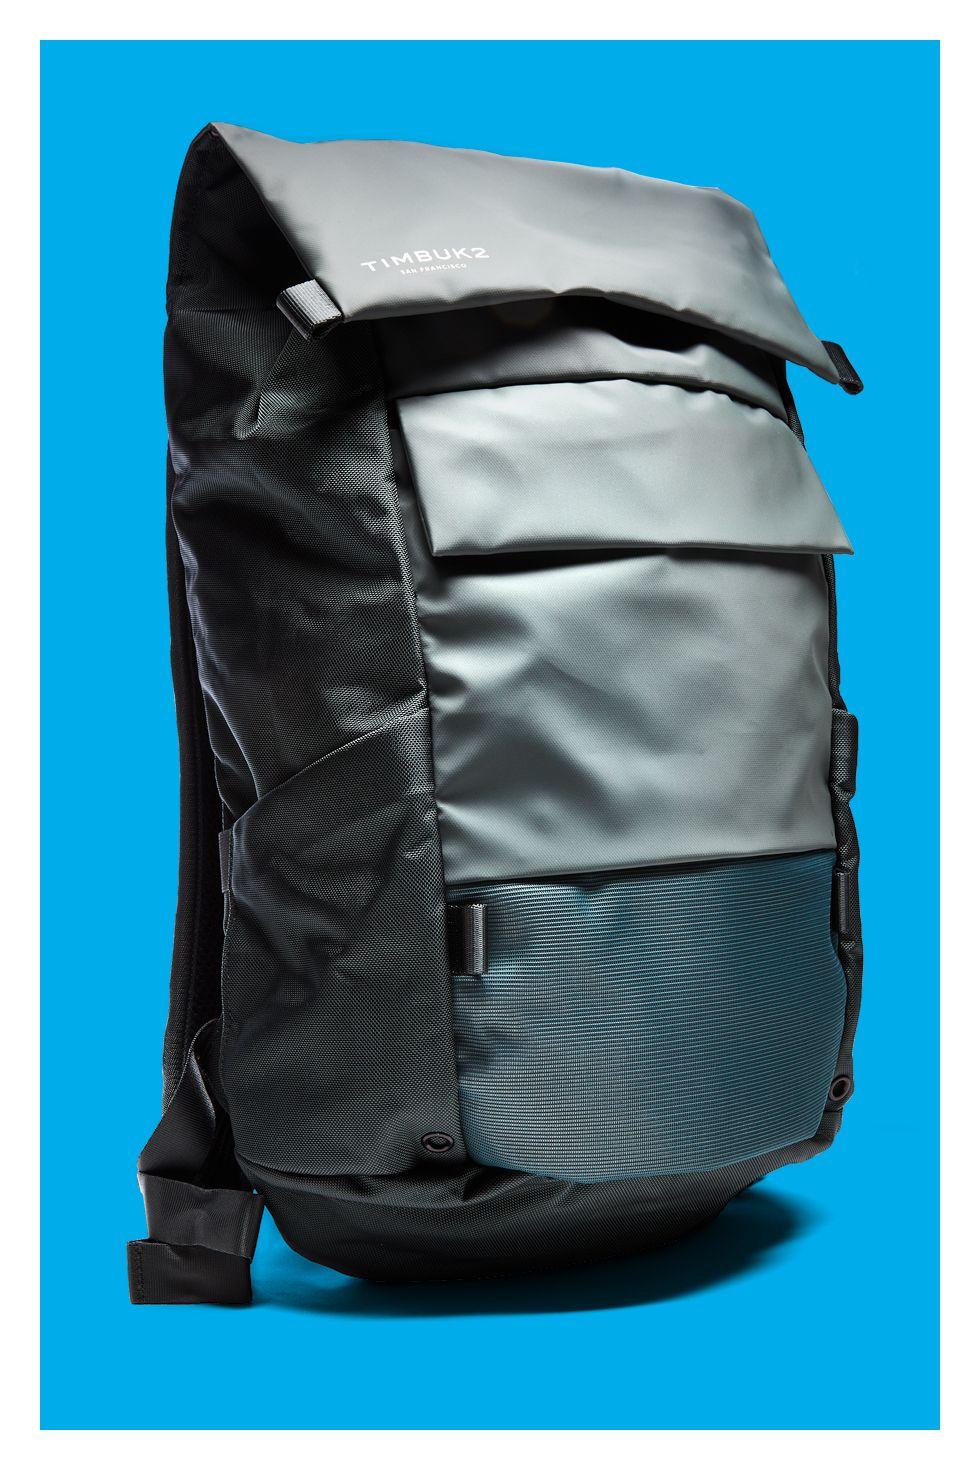 Timbuk2 Robin Commuter Backpack